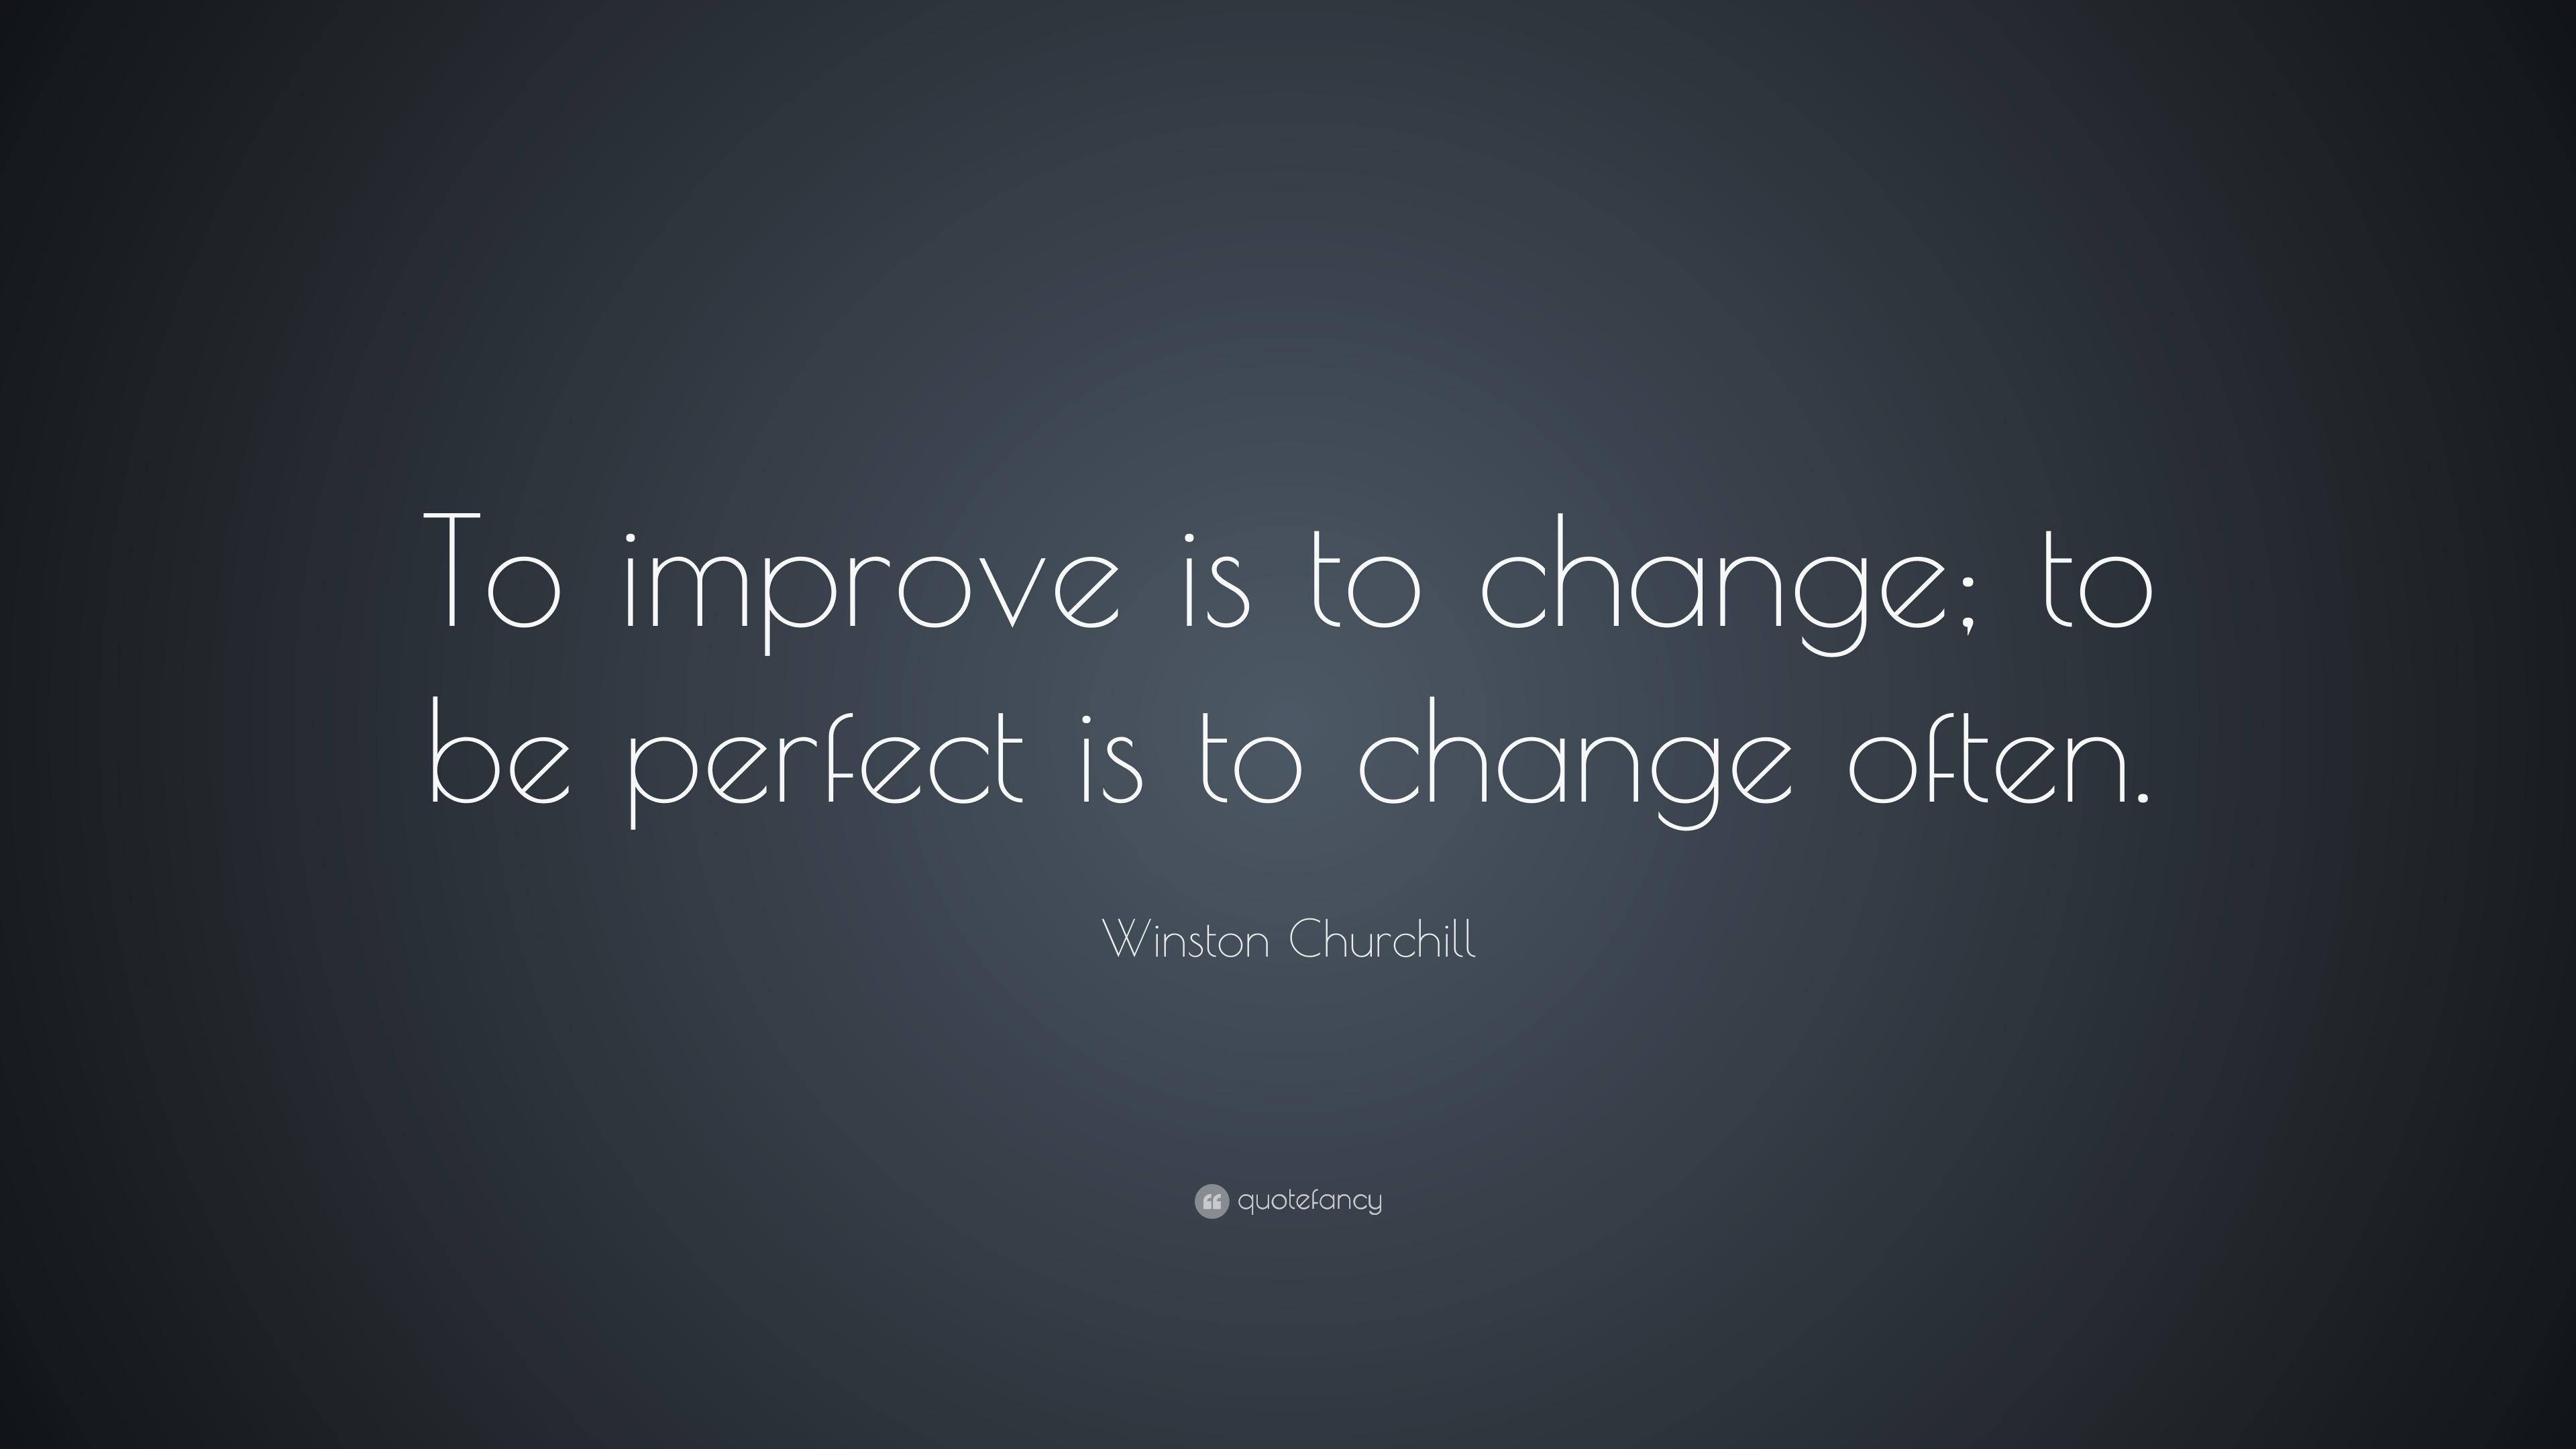 Perfect Winston Churchill Quotes Change